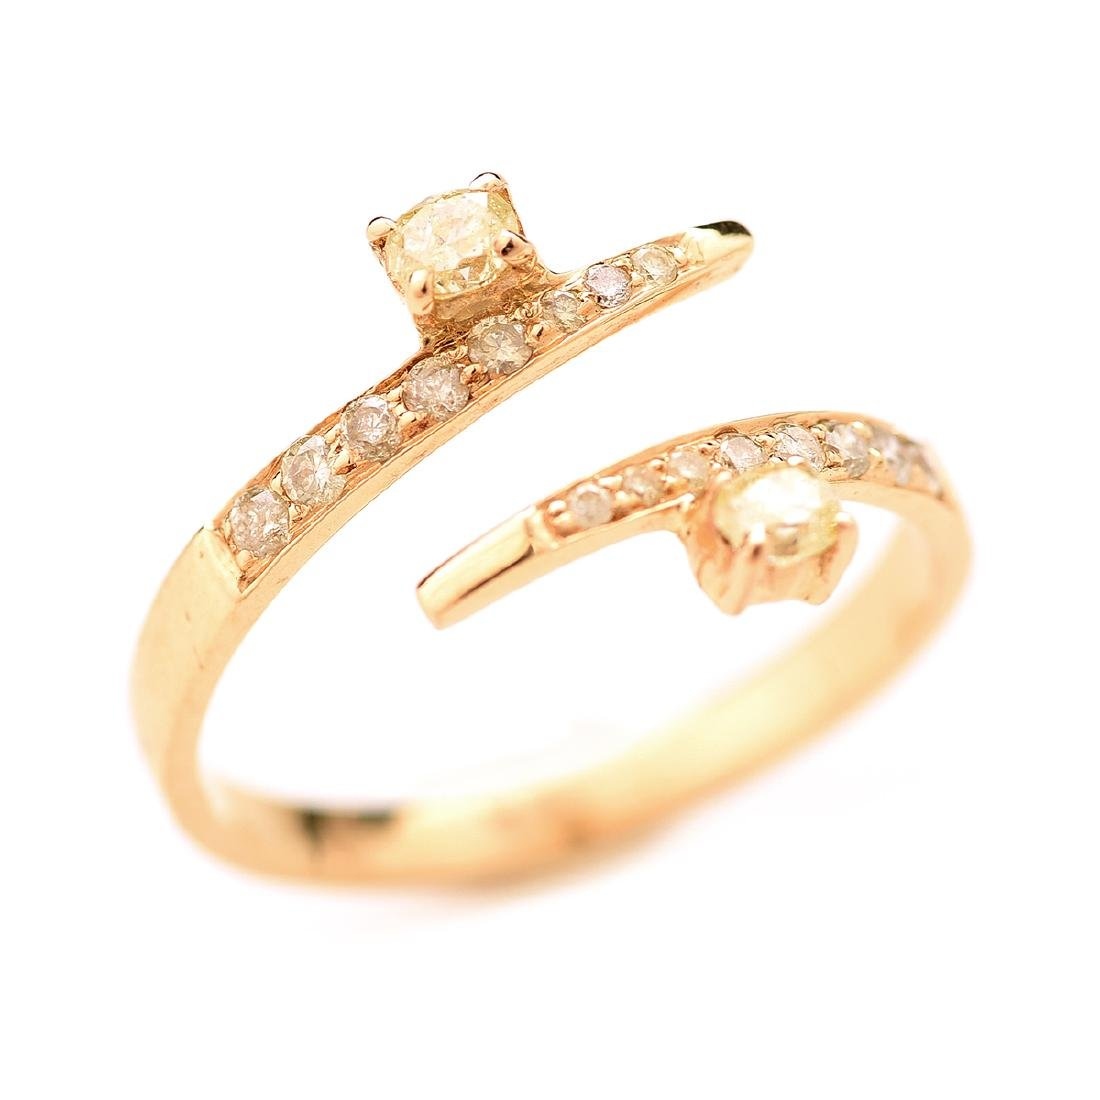 Diamond, 18k Yellow Gold Bypass Ring.